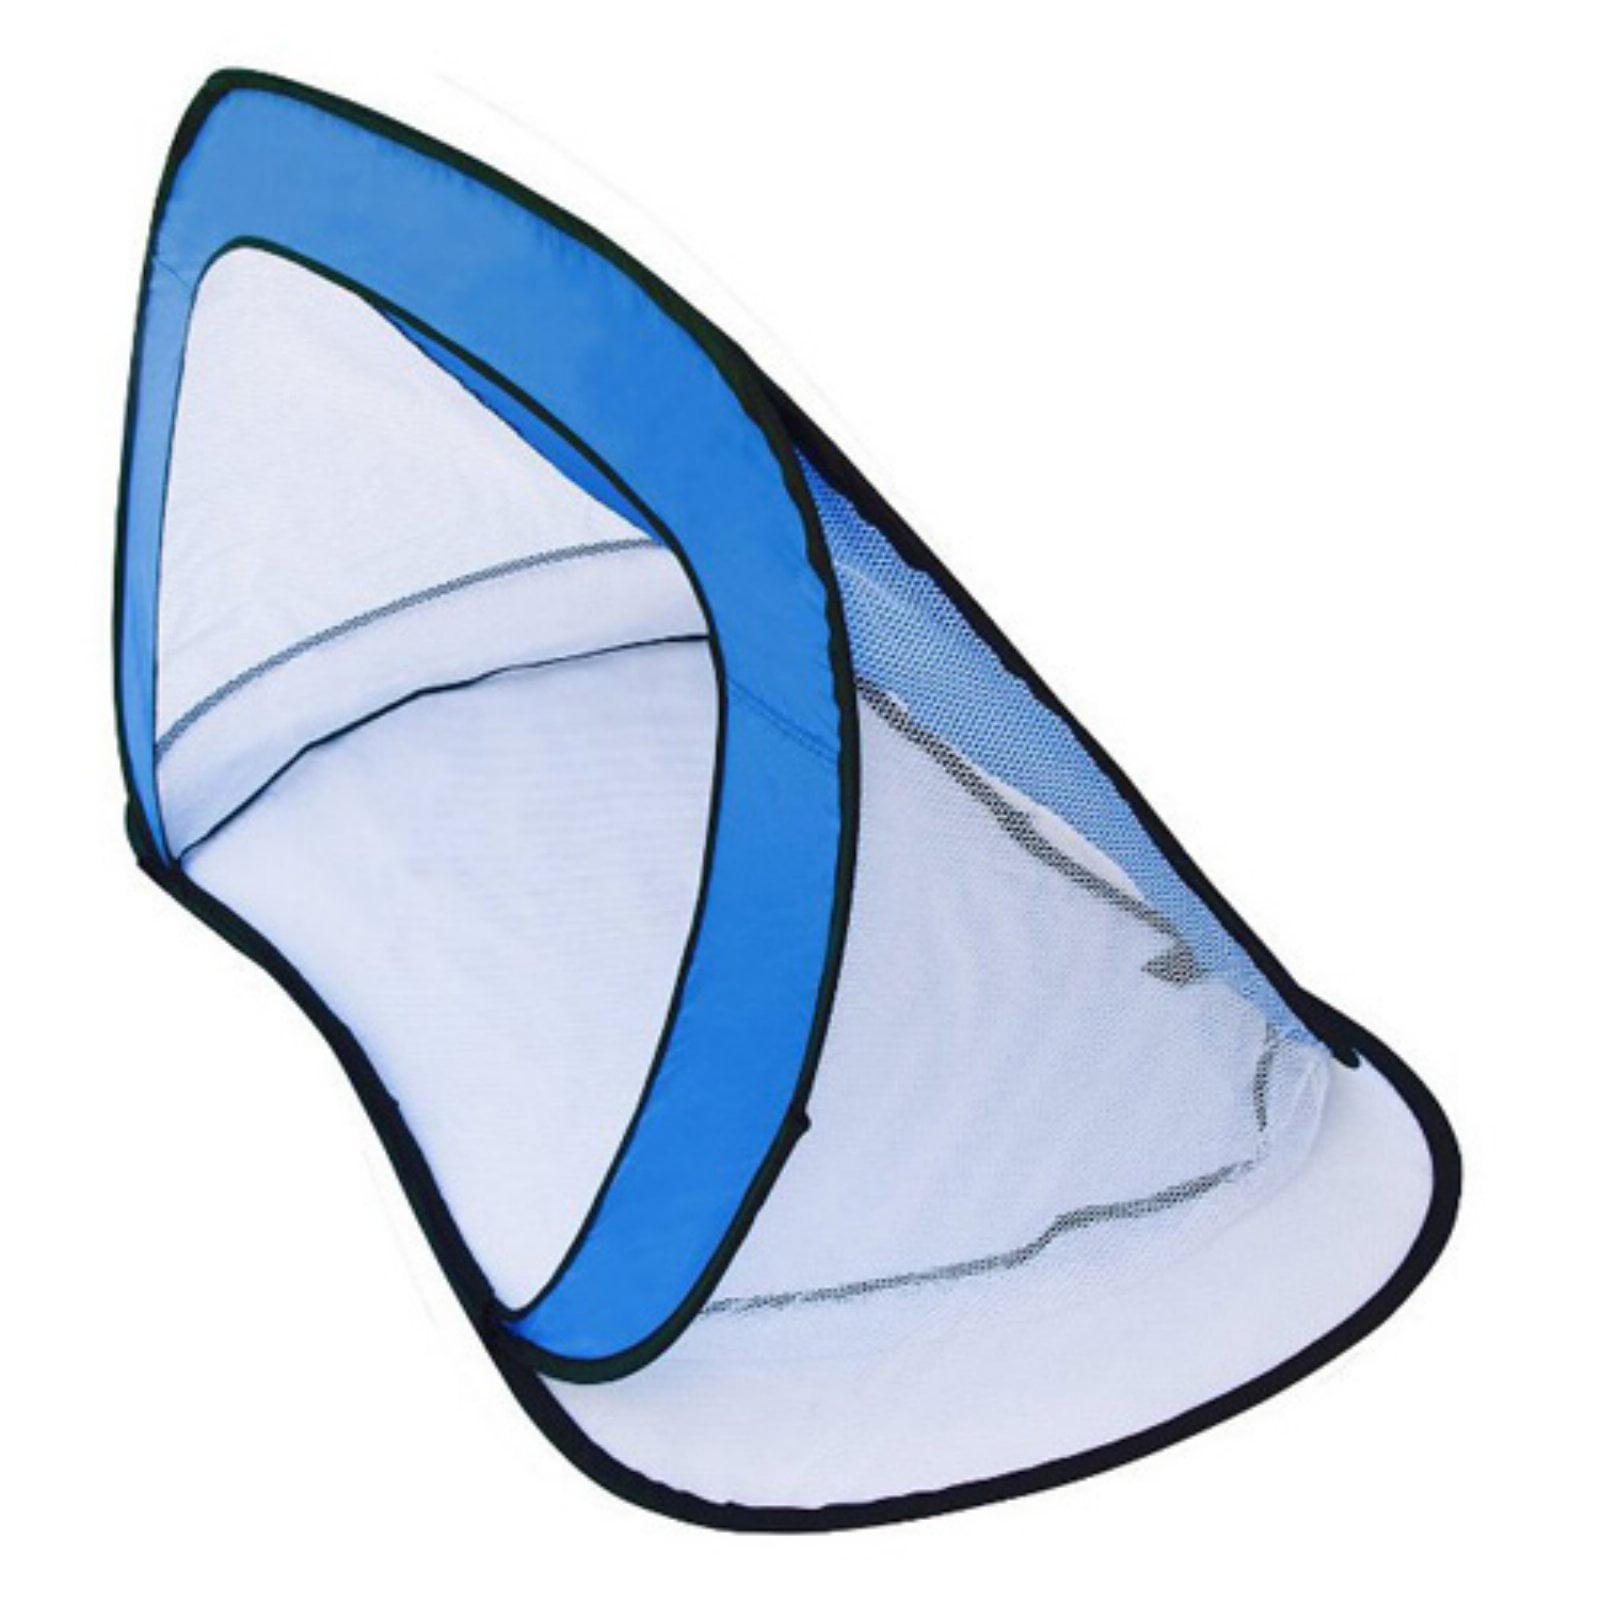 "ALEKO PUSG03 Portable Pop-Up Soccer Goal and Net with Carry Bag, 28"" x 52"", Blue"